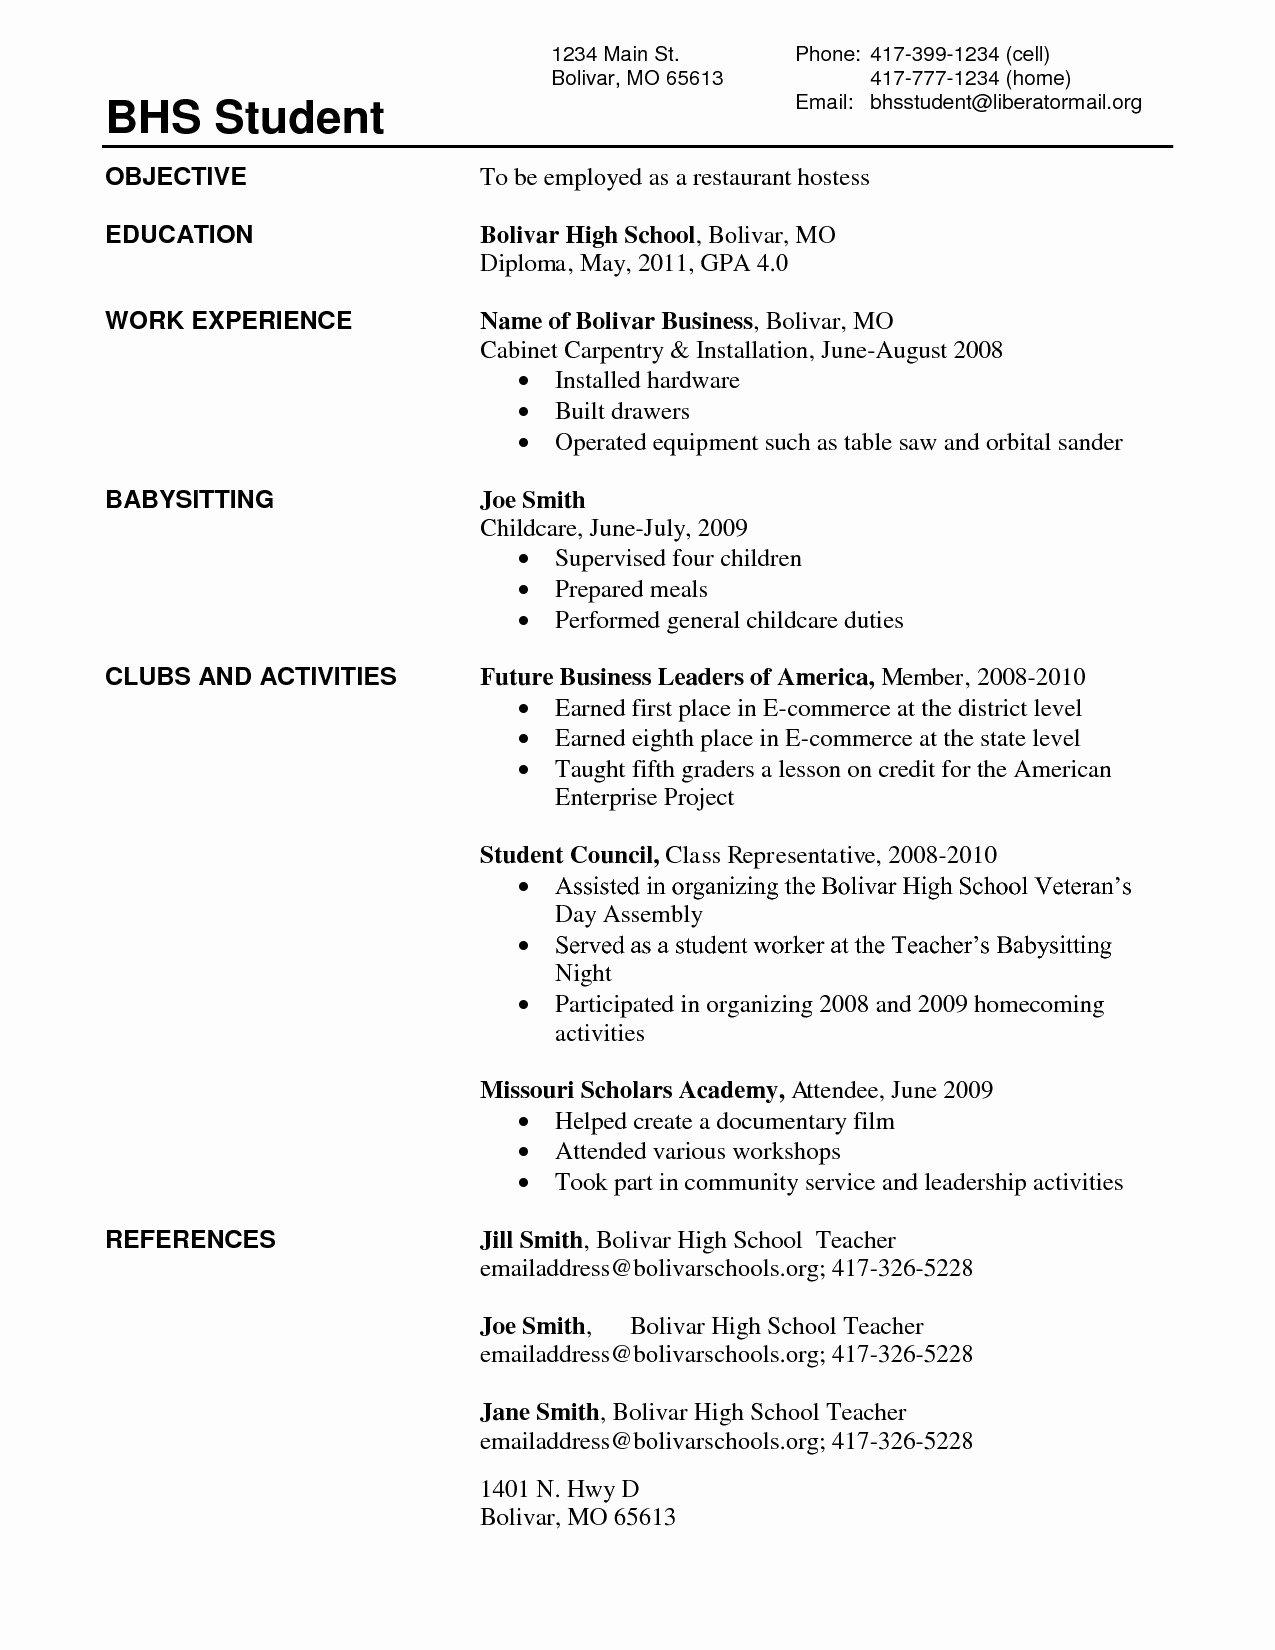 Sample Resume for Recent High School Graduate Free